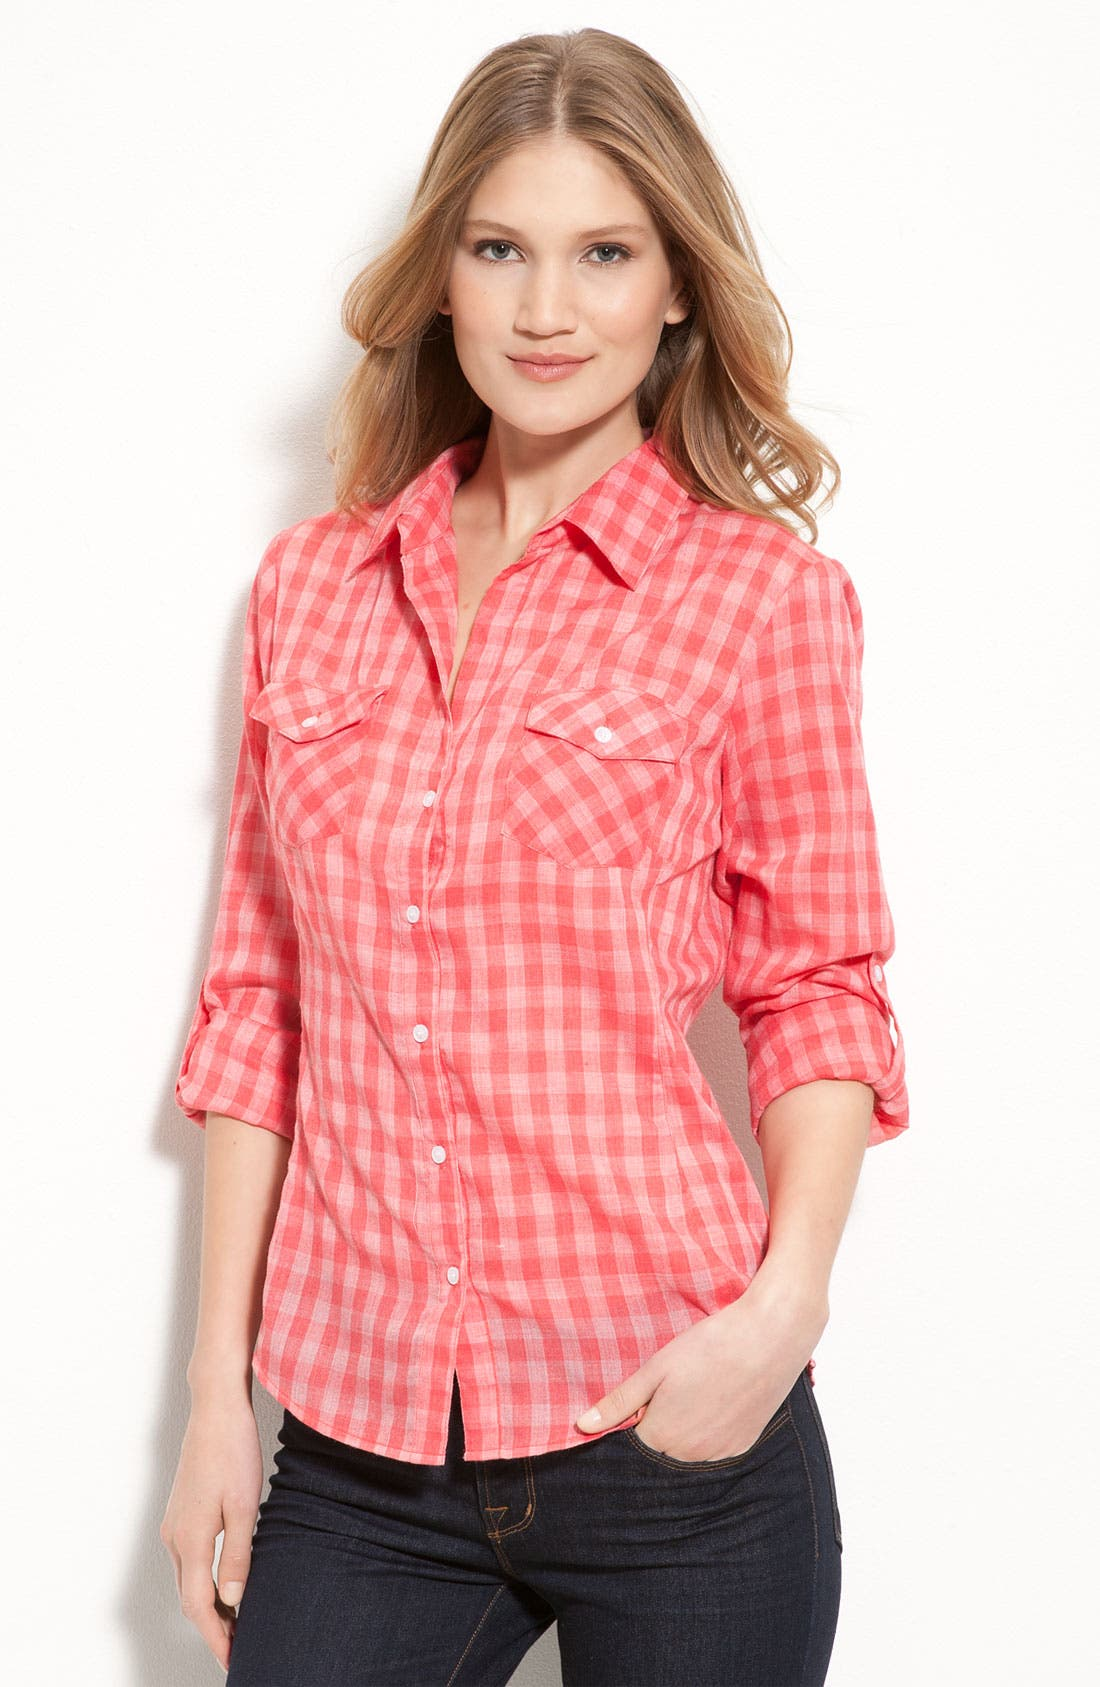 Alternate Image 1 Selected - Sandra Ingrish Roll Sleeve Gingham Shirt (Petite)